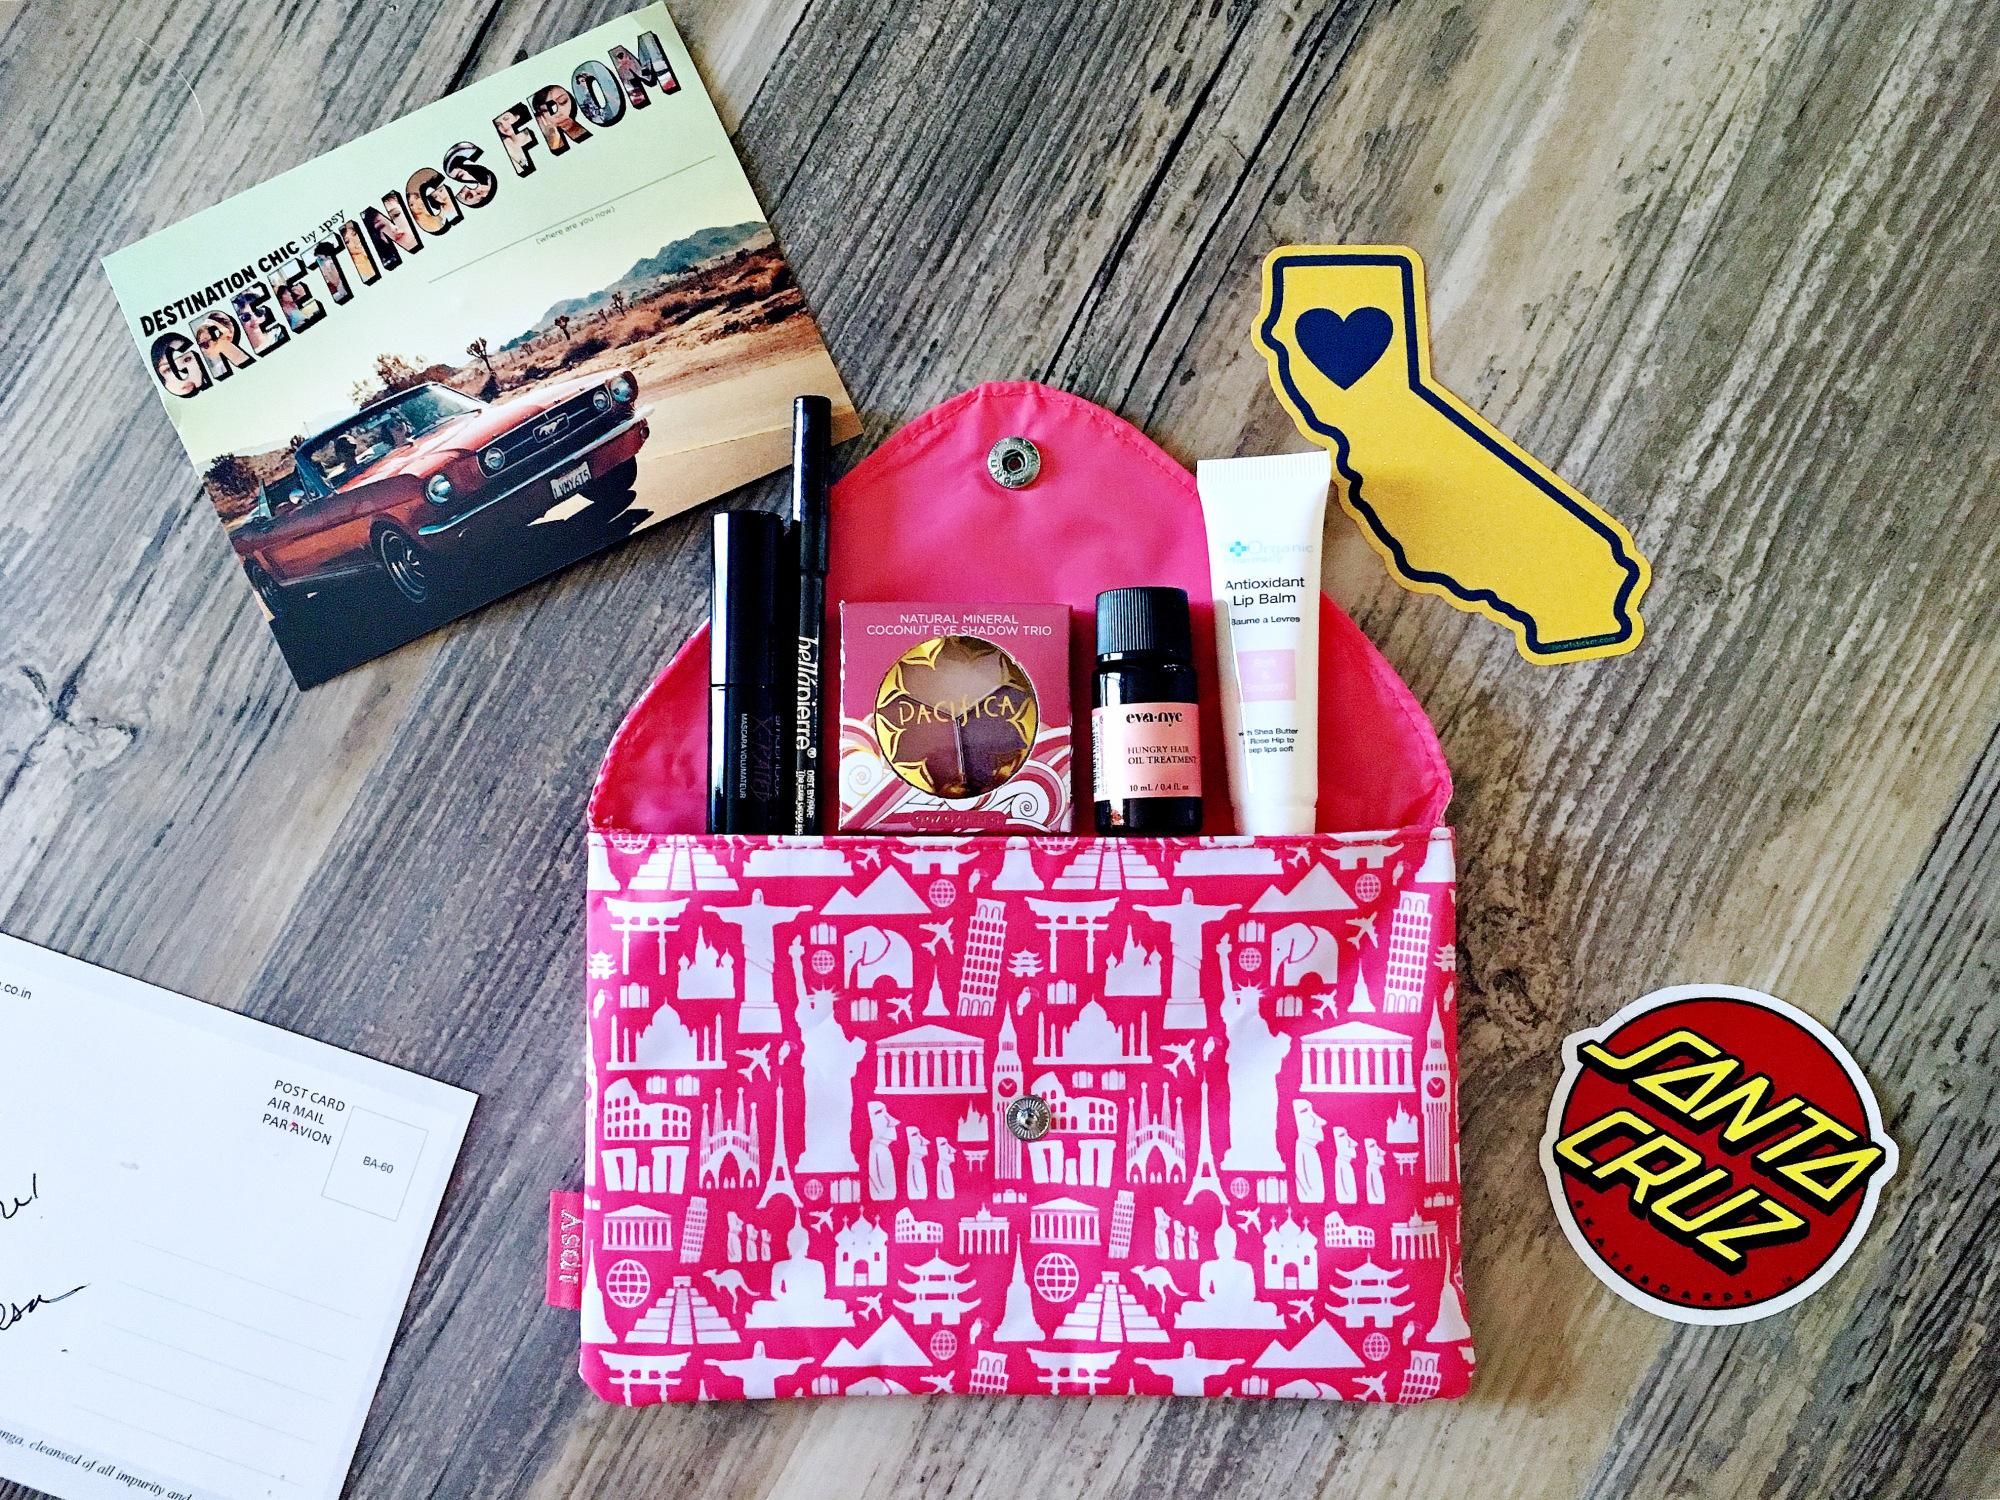 Lixibox bag comestic